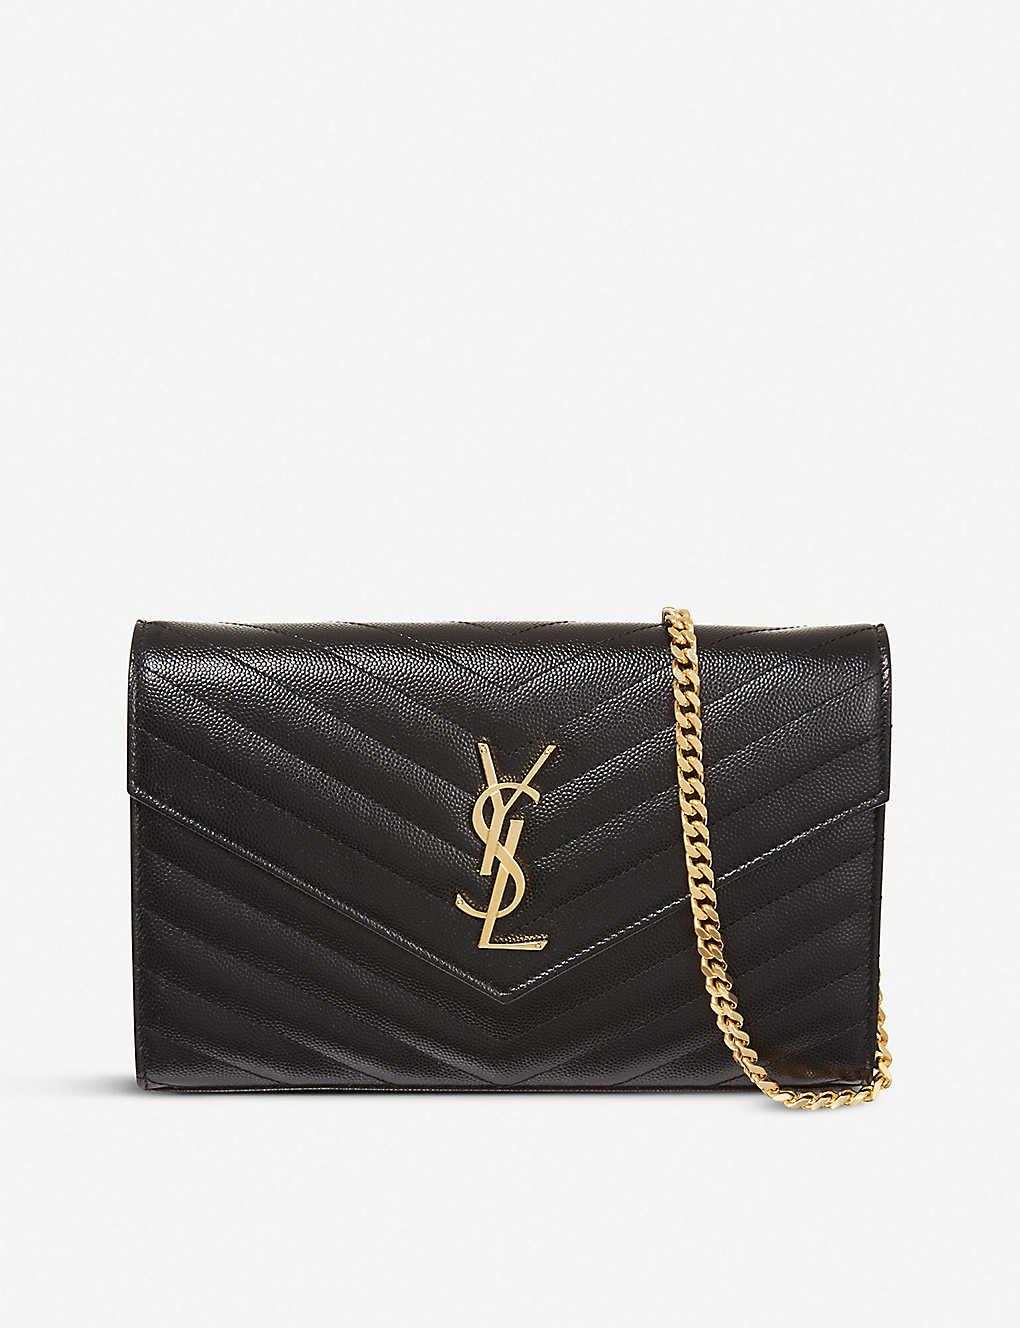 c5dc8942883 SAINT LAURENT - Monogram quilted-leather shoulder bag | Selfridges.com